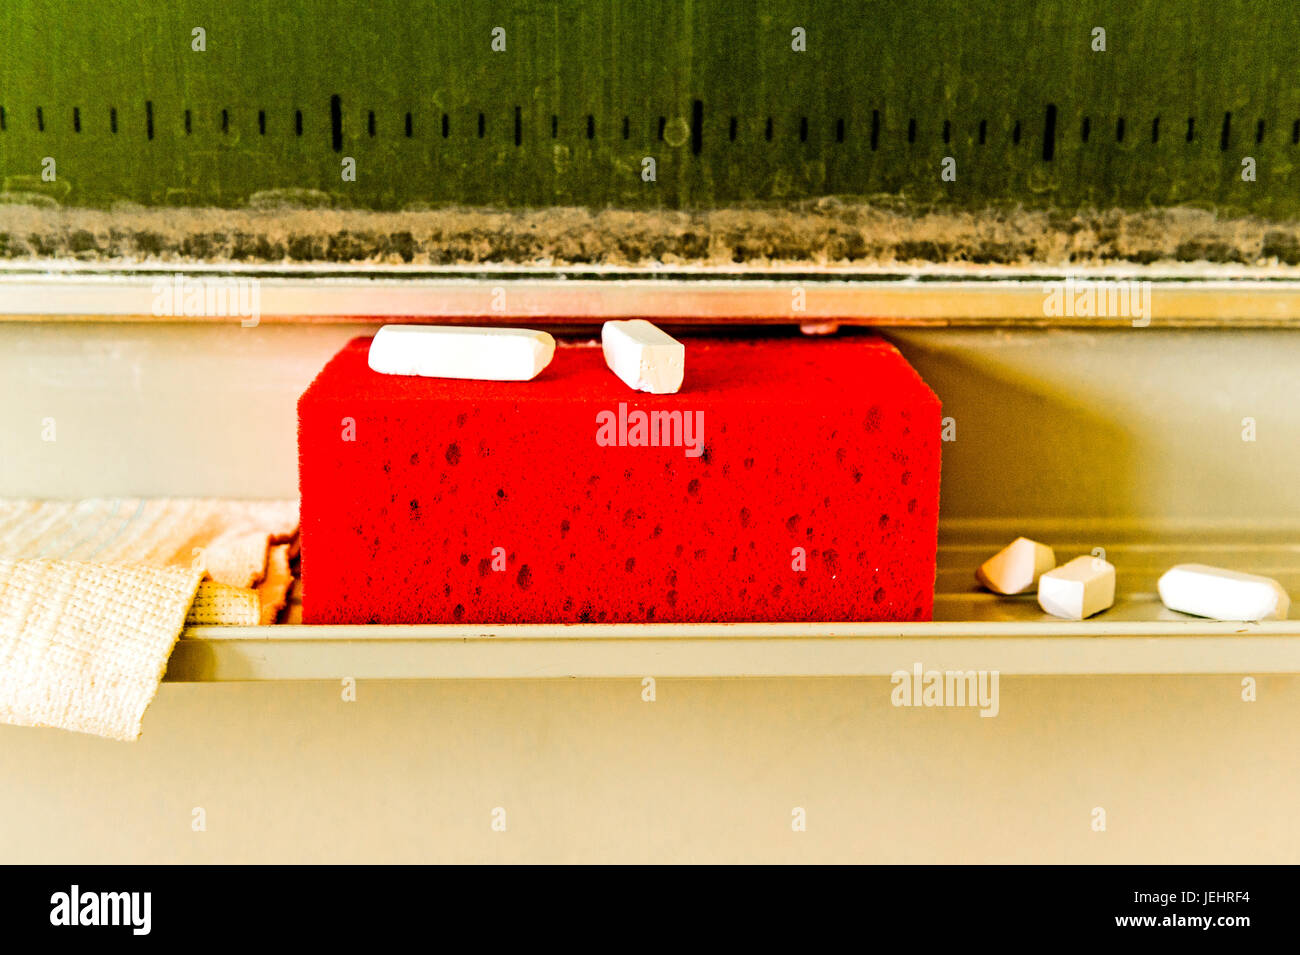 Tafel mit Schwamm und Kreide; lavagna con spugna e chalk Immagini Stock